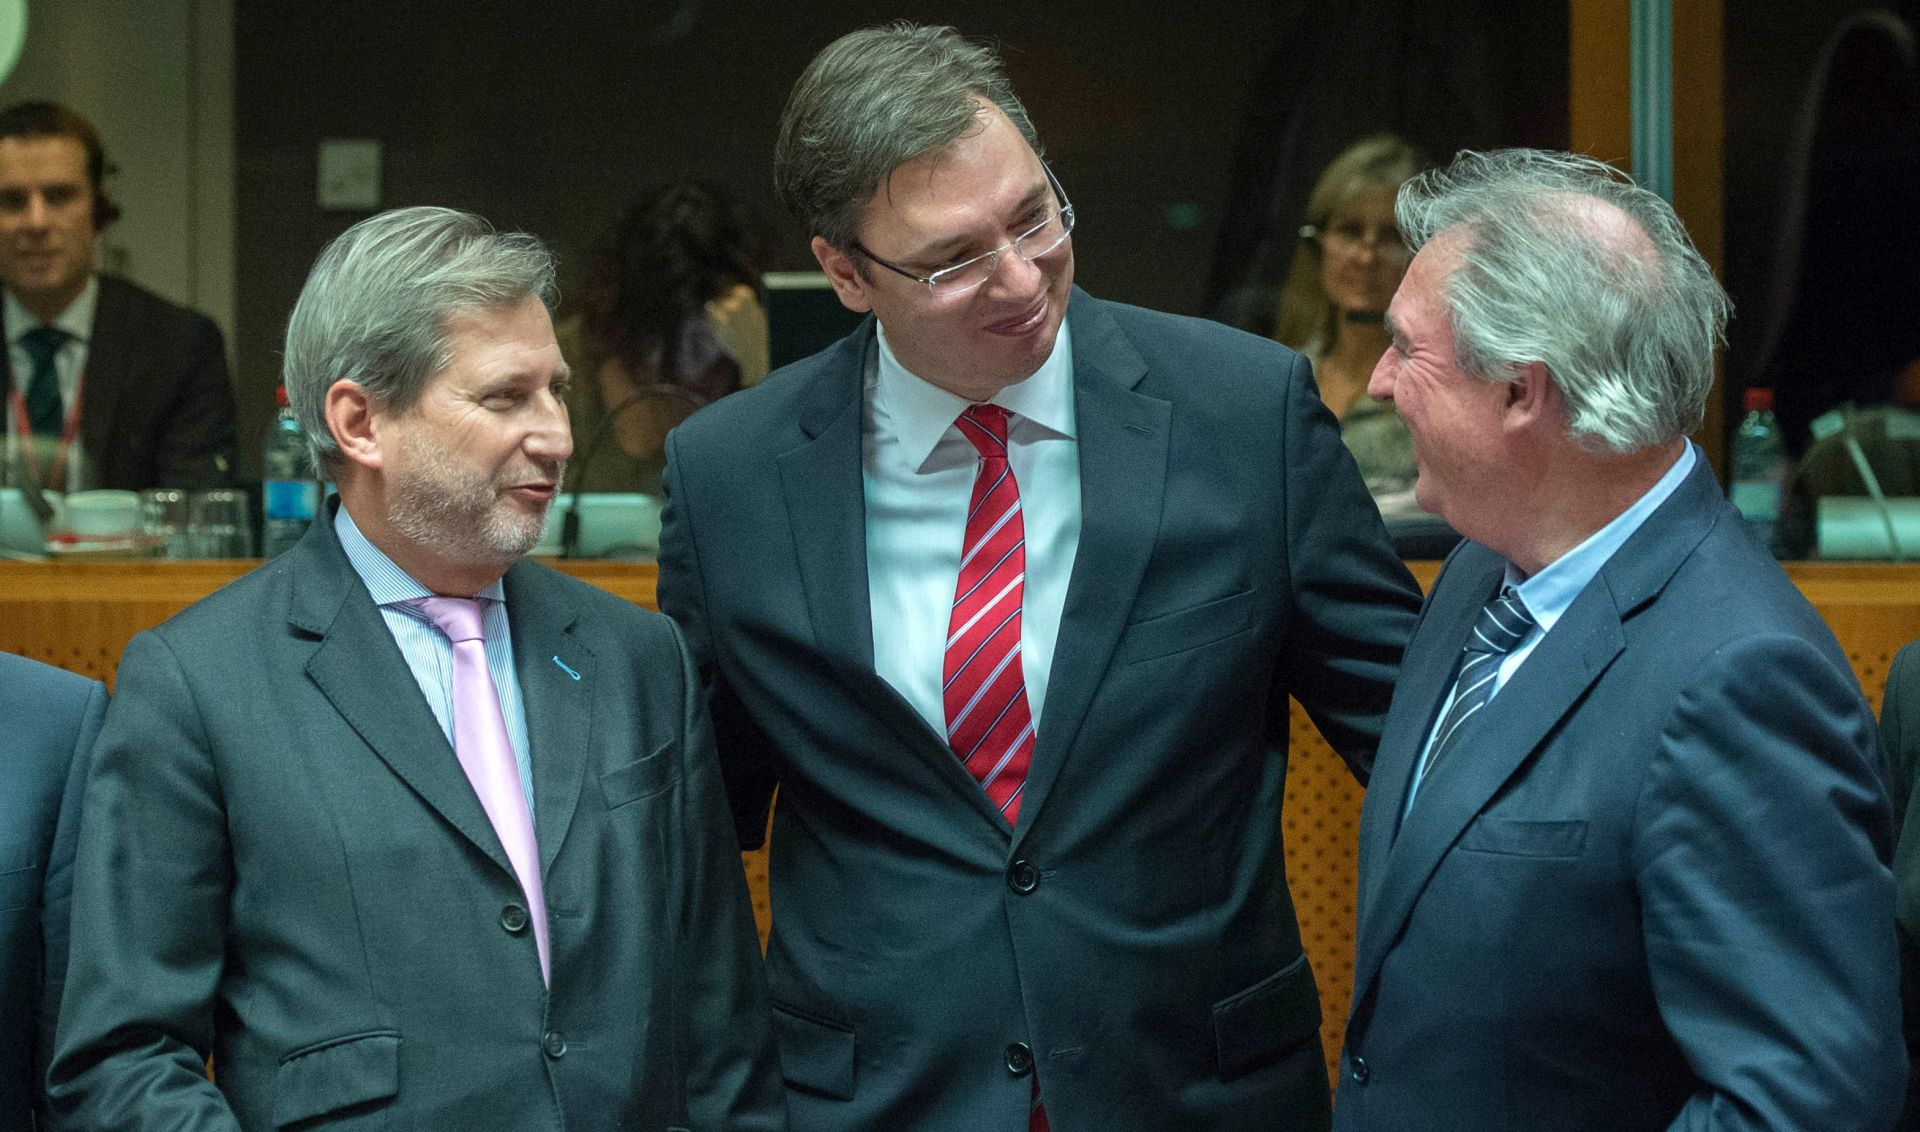 PRISTUPNI PREGOVORI: Srbija otvorila prva pregovaračka poglavlja s EU-om